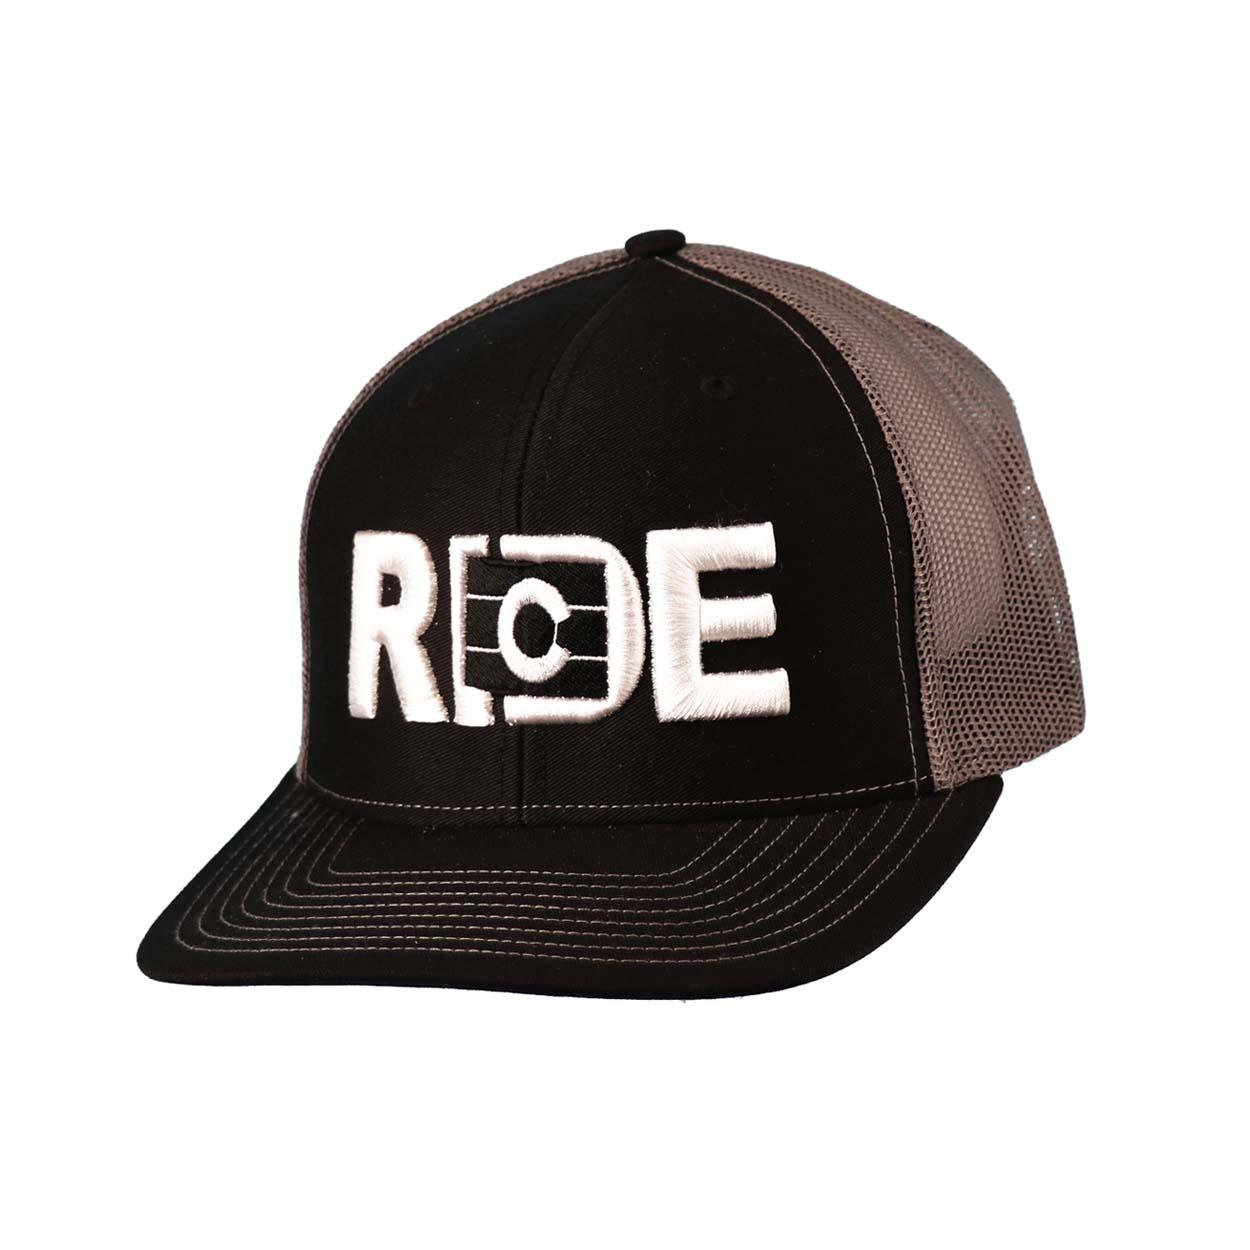 Ride Colorado Classic Embroidered Snapback Trucker Hat Black/White